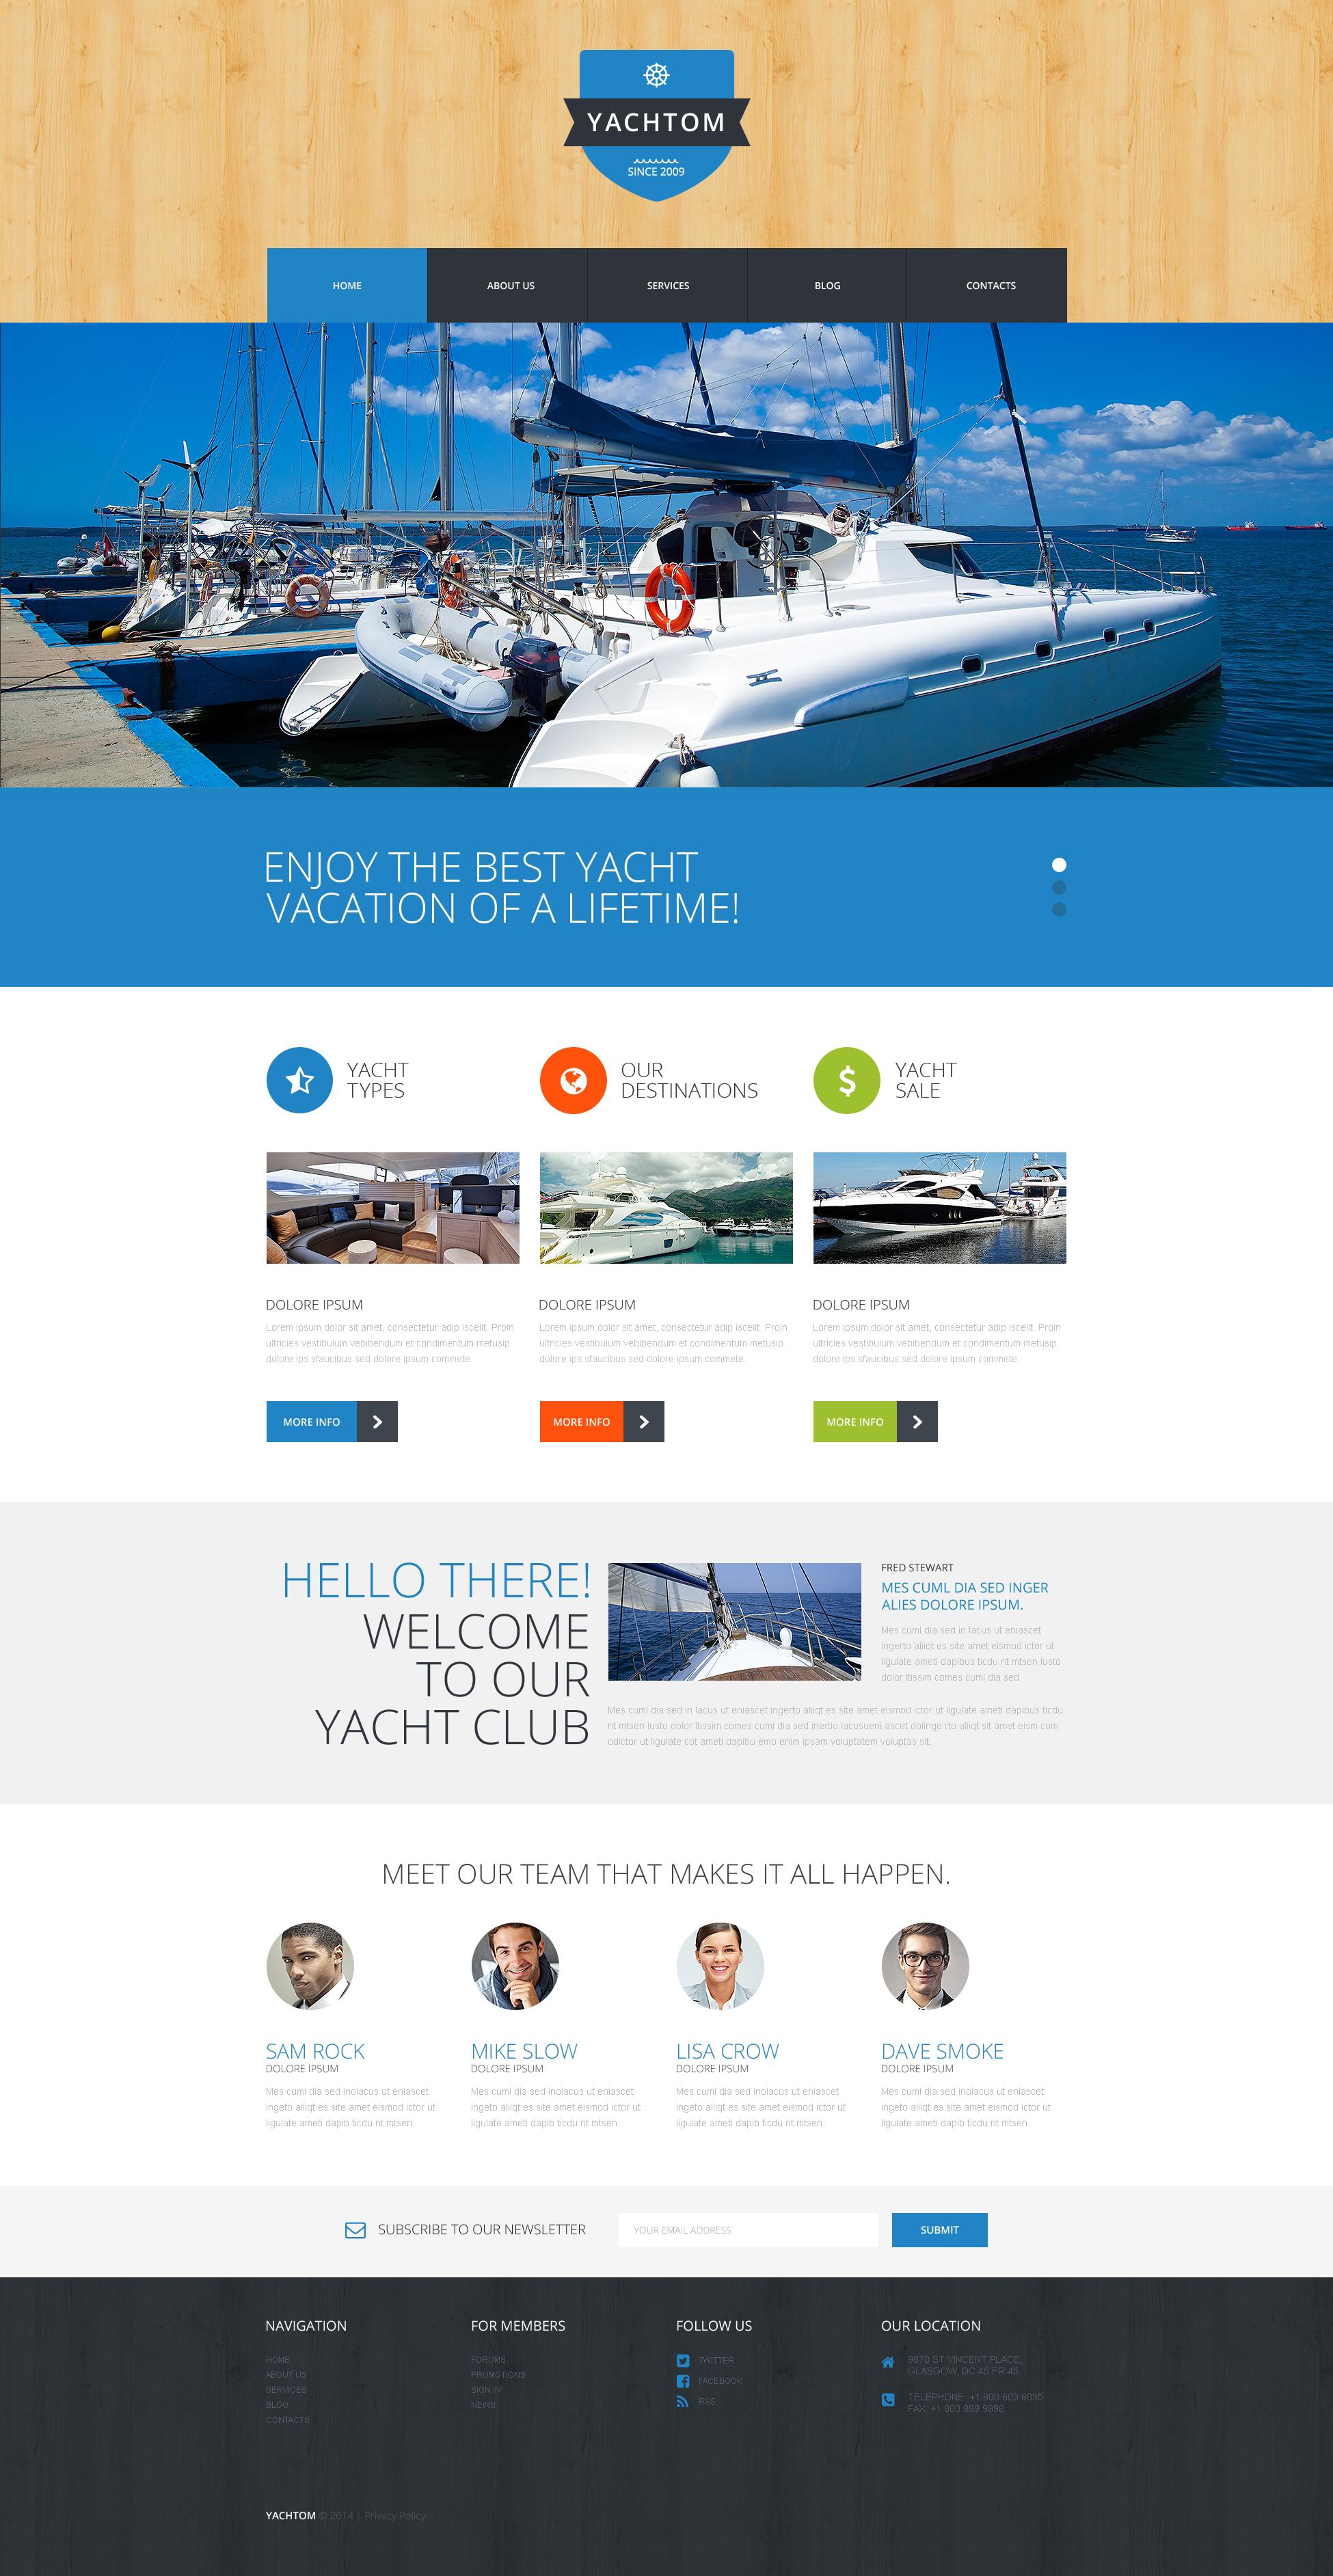 Pleasant Yachting Experience Tema WordPress №50885 - captura de tela